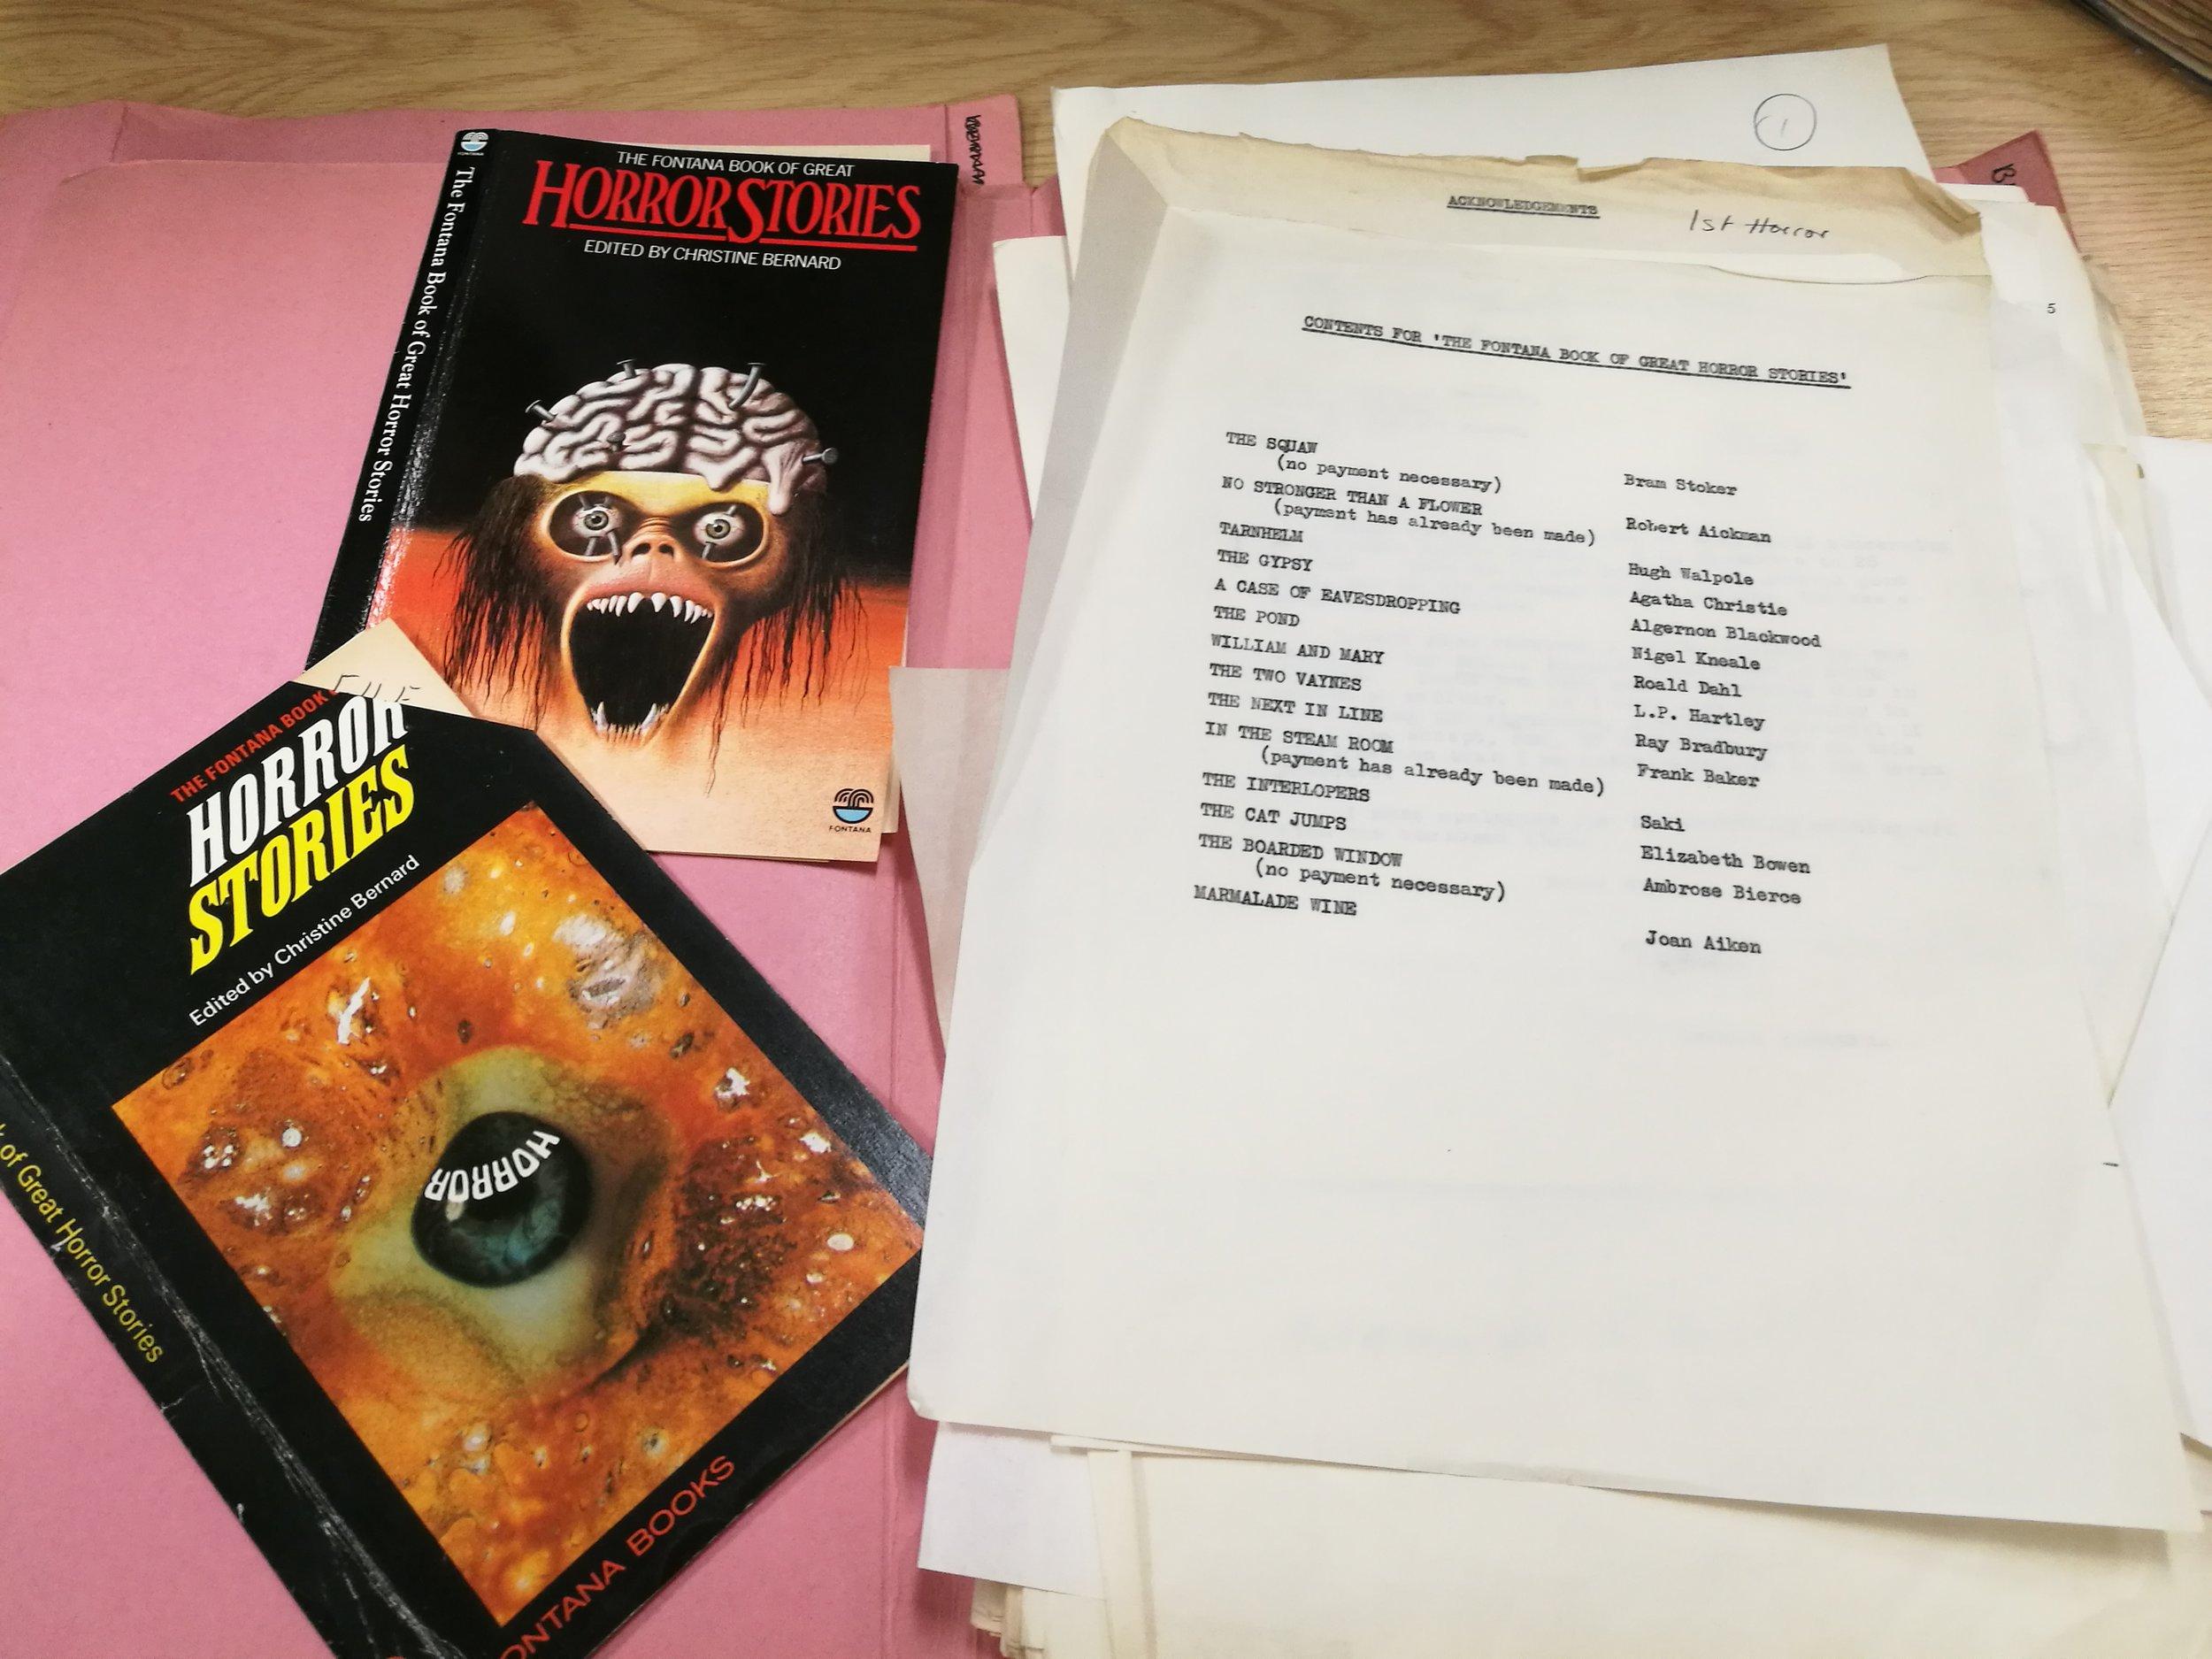 LB - Image - Horror Lounge - Dawn Sinclair - 1st book file.jpg